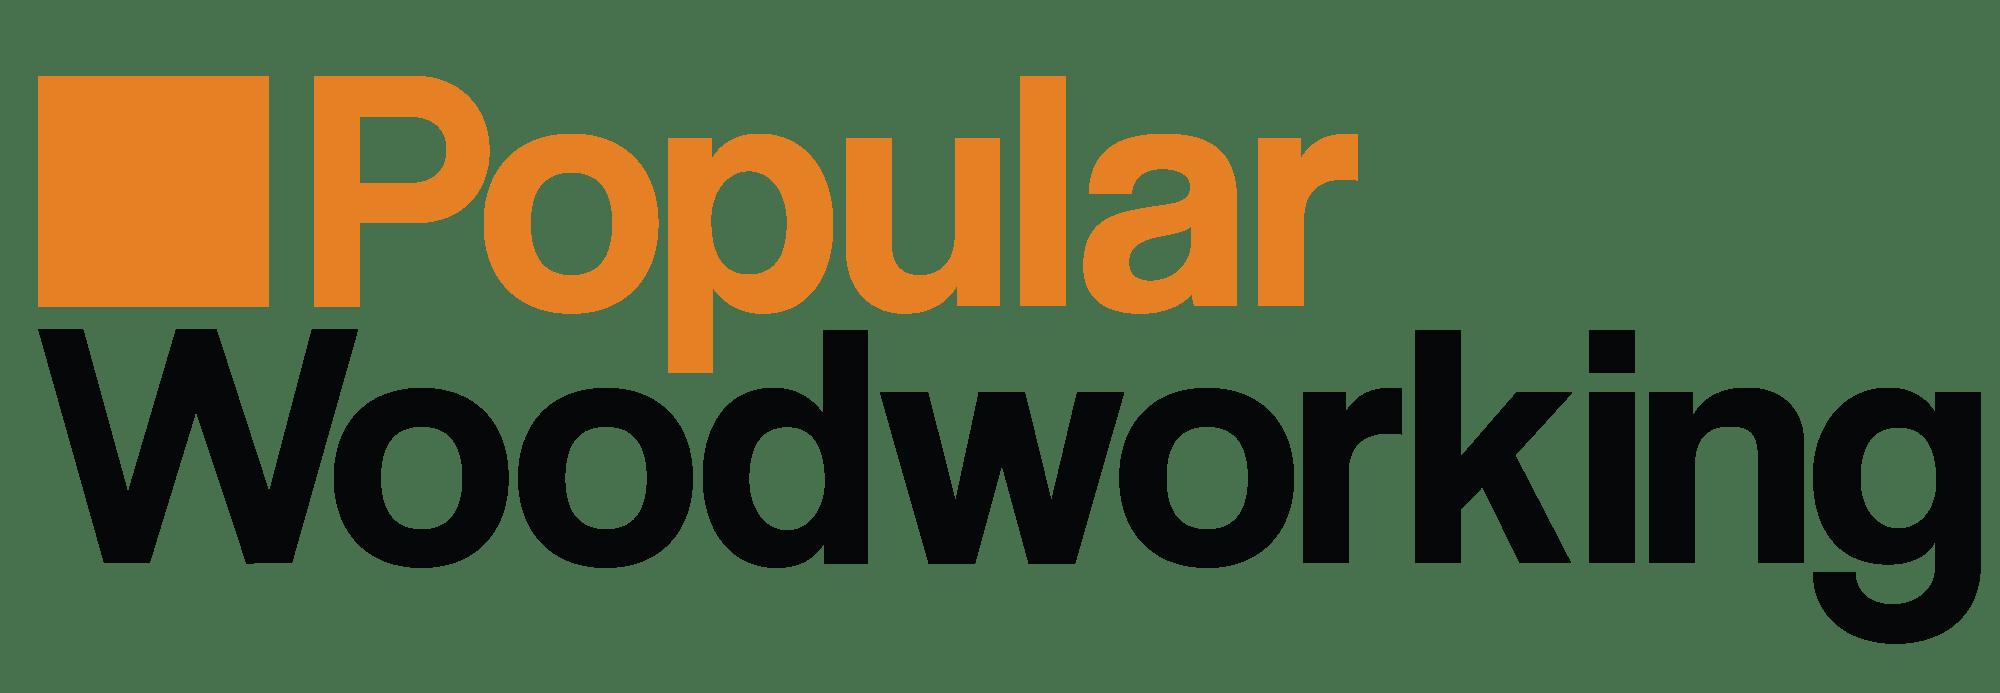 Popular Woodworking Logo